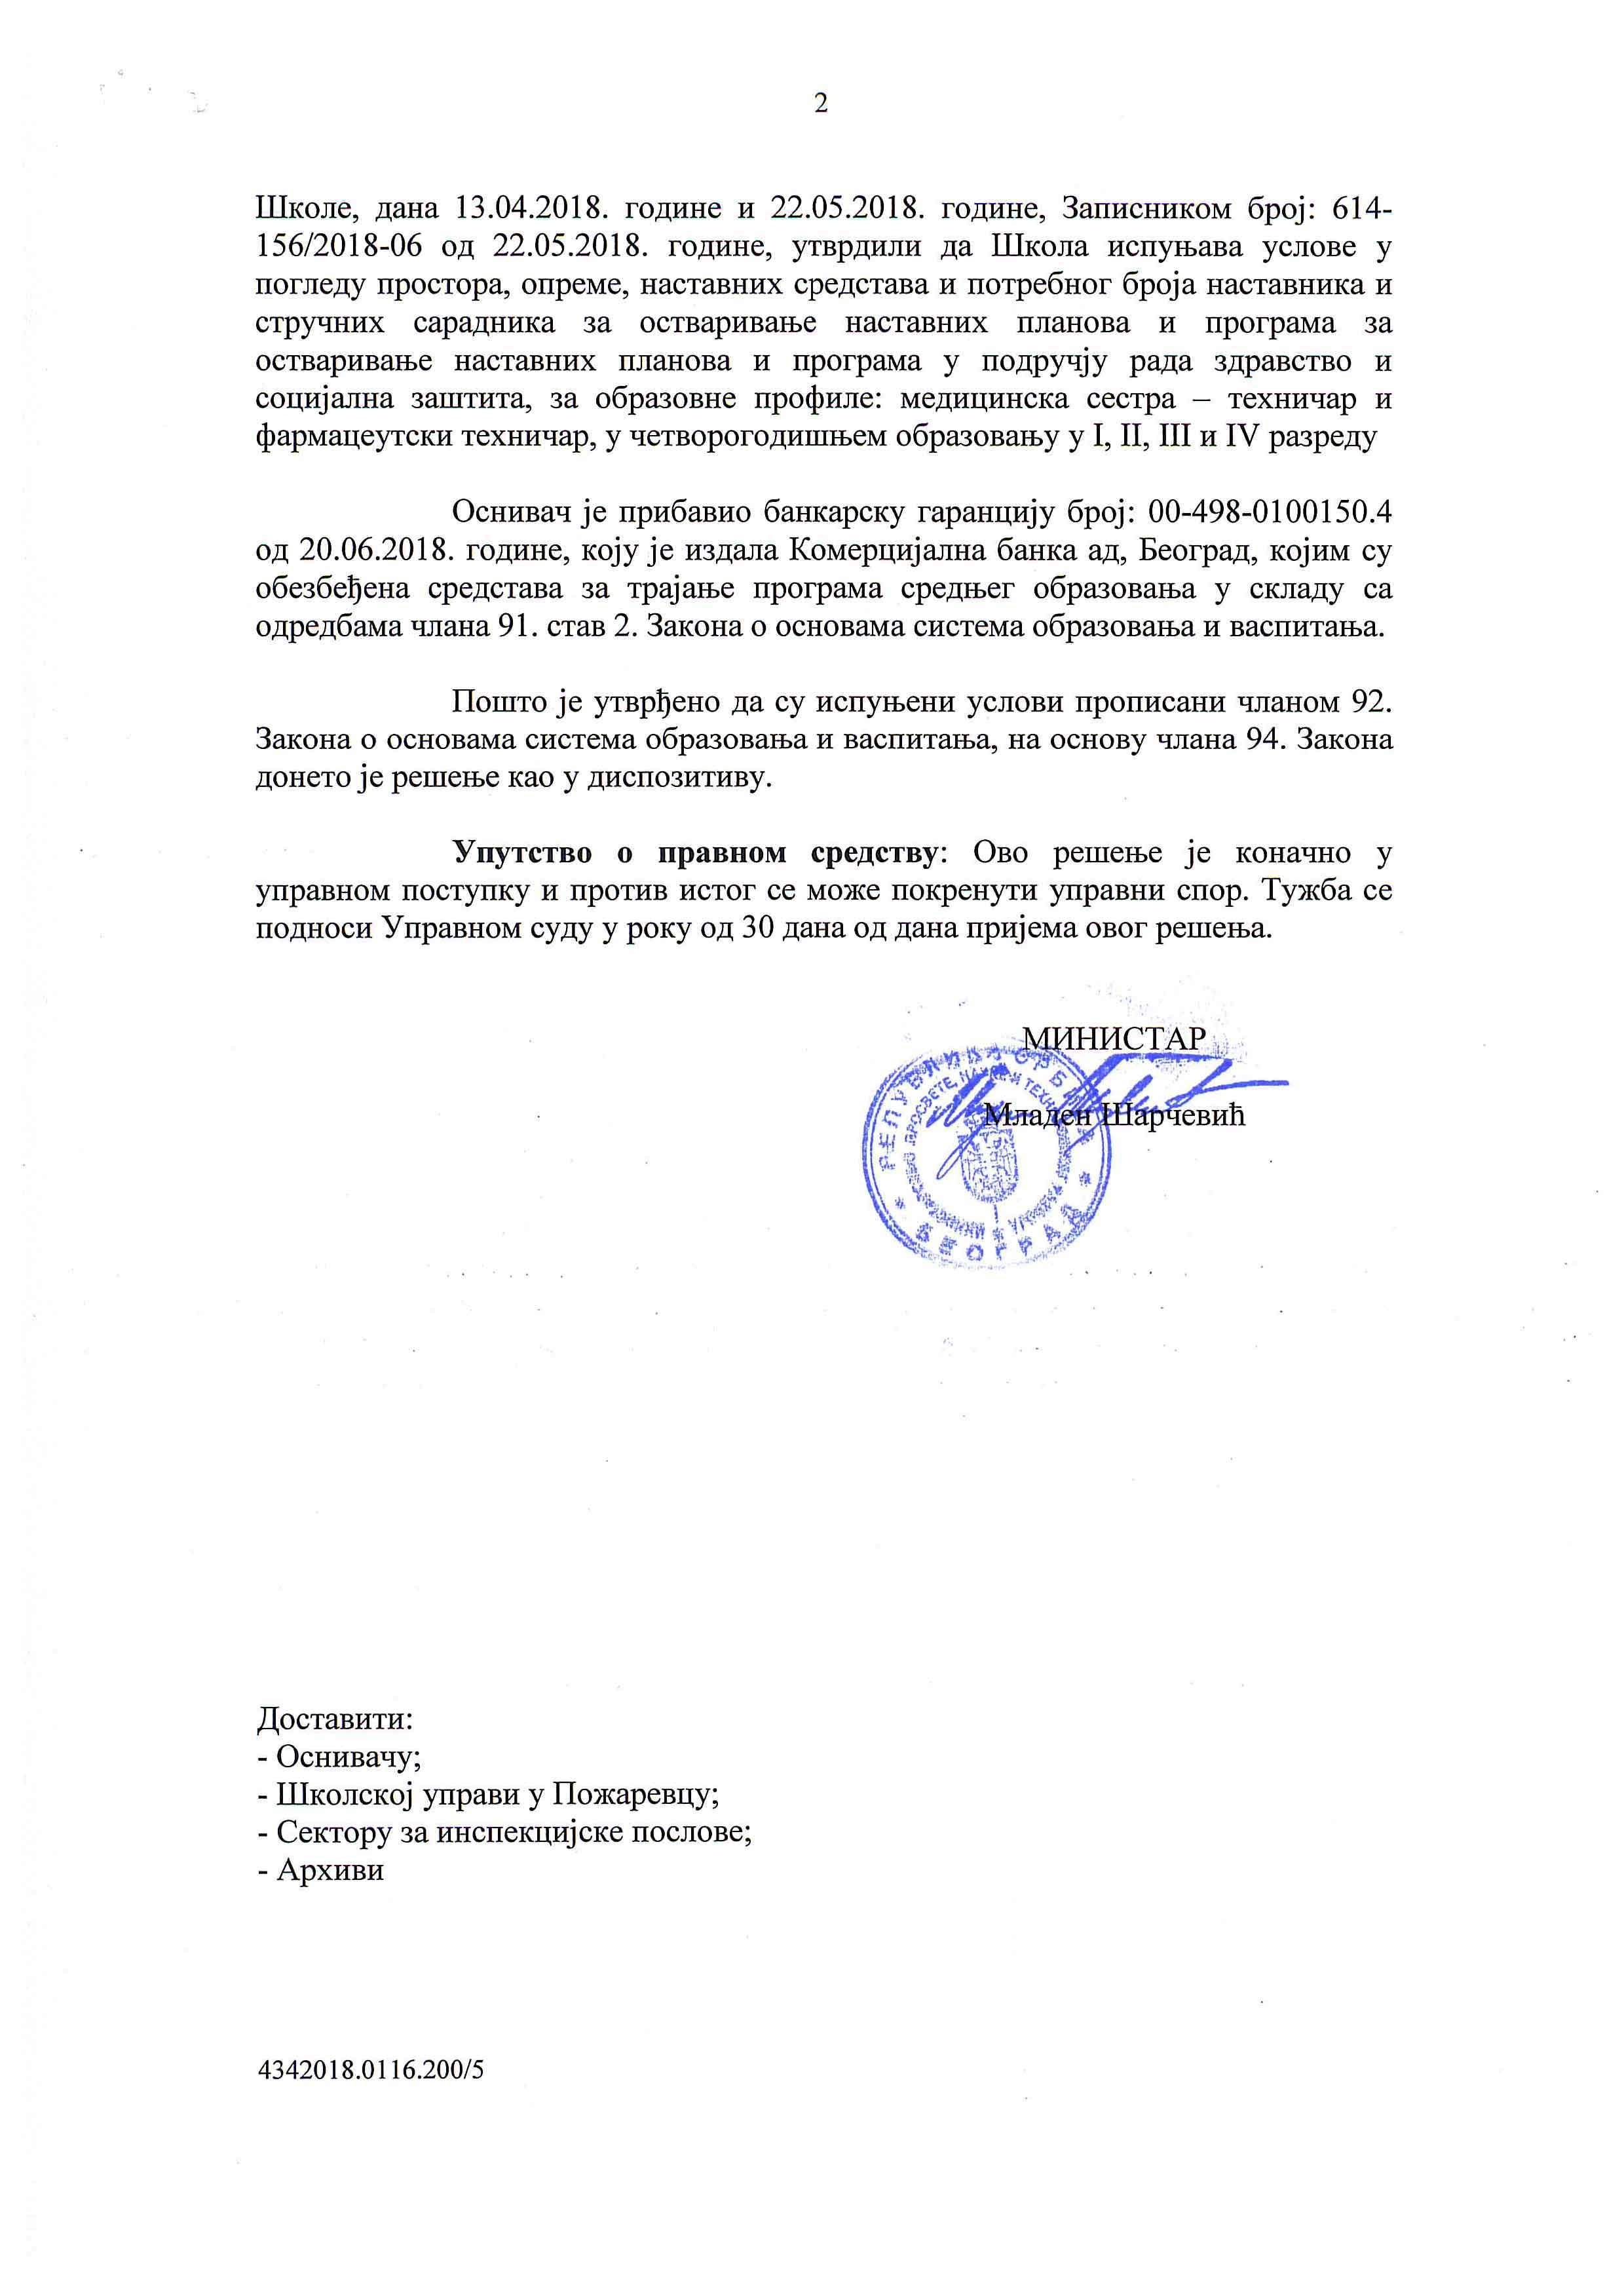 resenje-ministarstva-prosvete-2